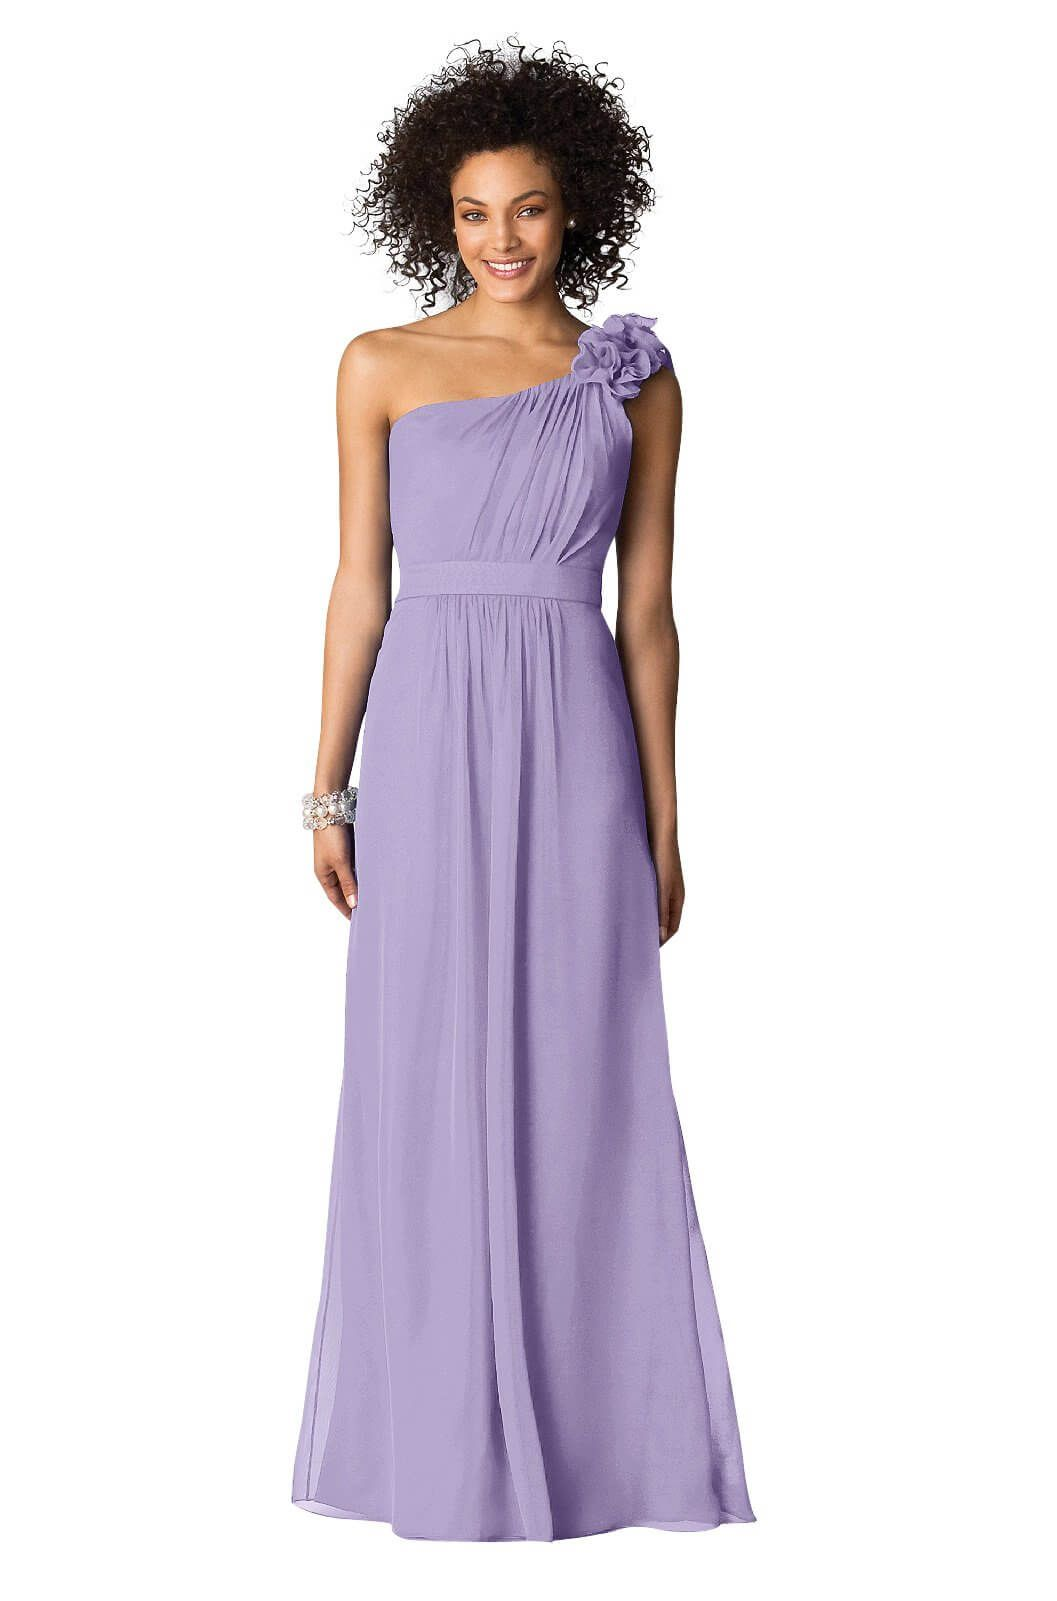 40 Best Picks of Lavender Bridesmaid Dresses | Lavender bridesmaid ...